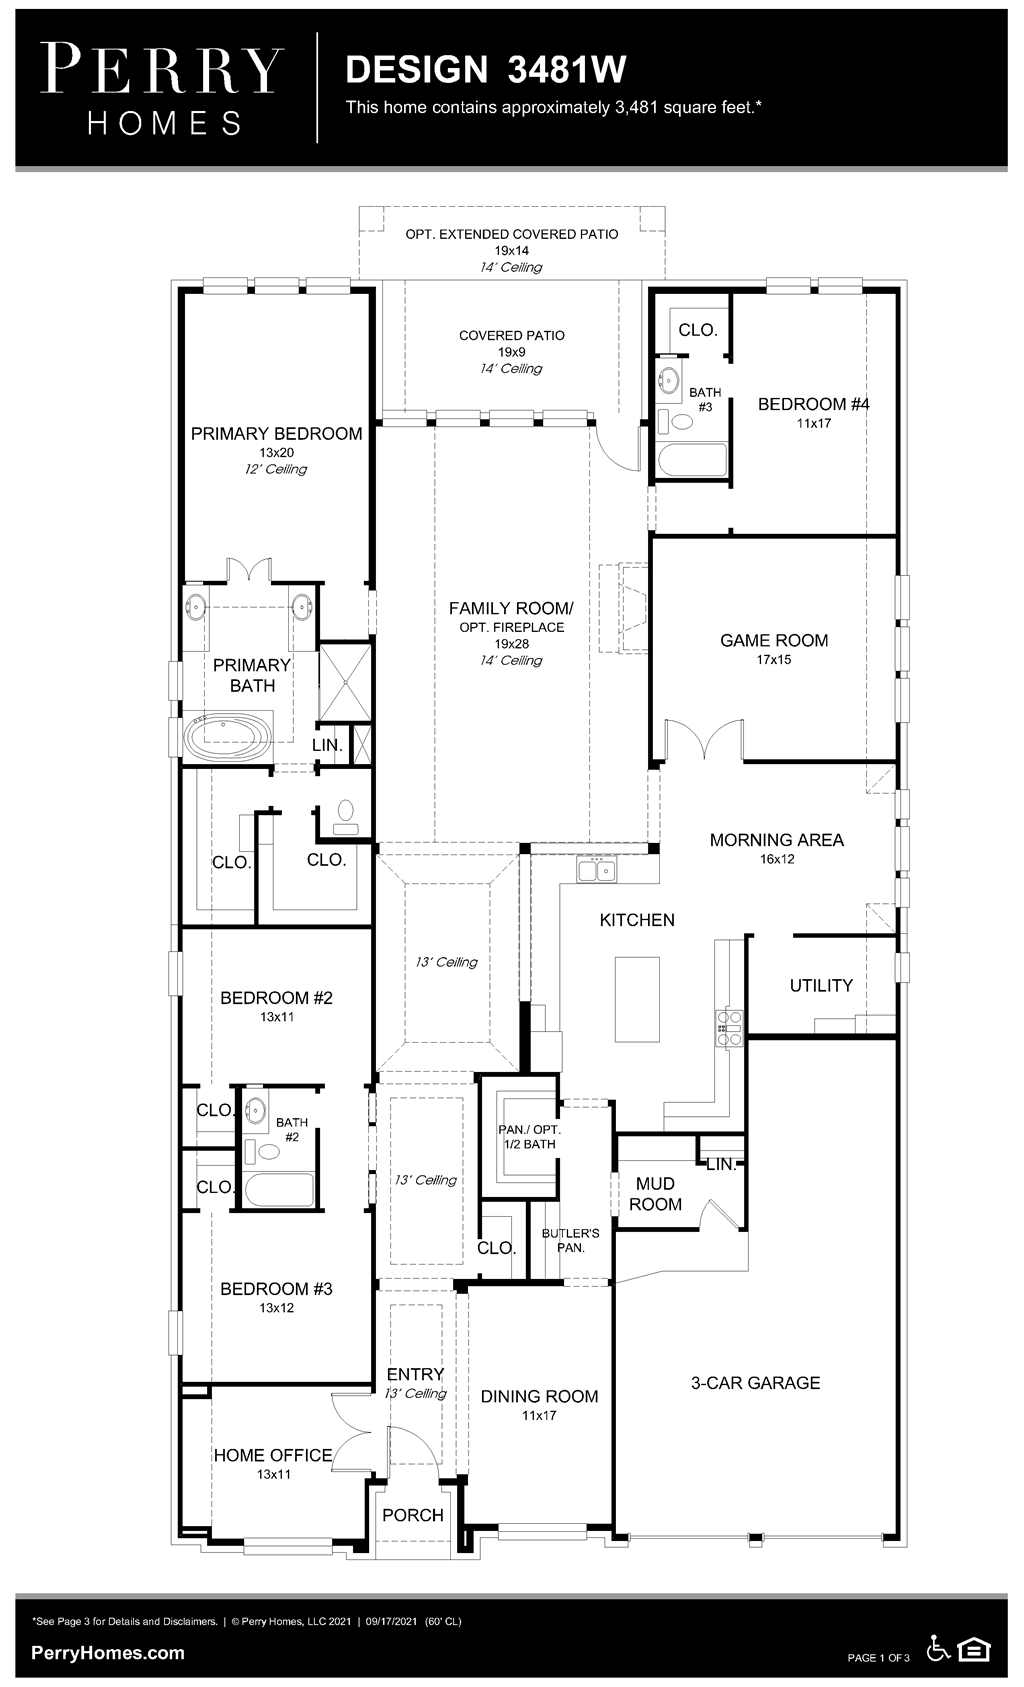 Floor Plan for 3481W